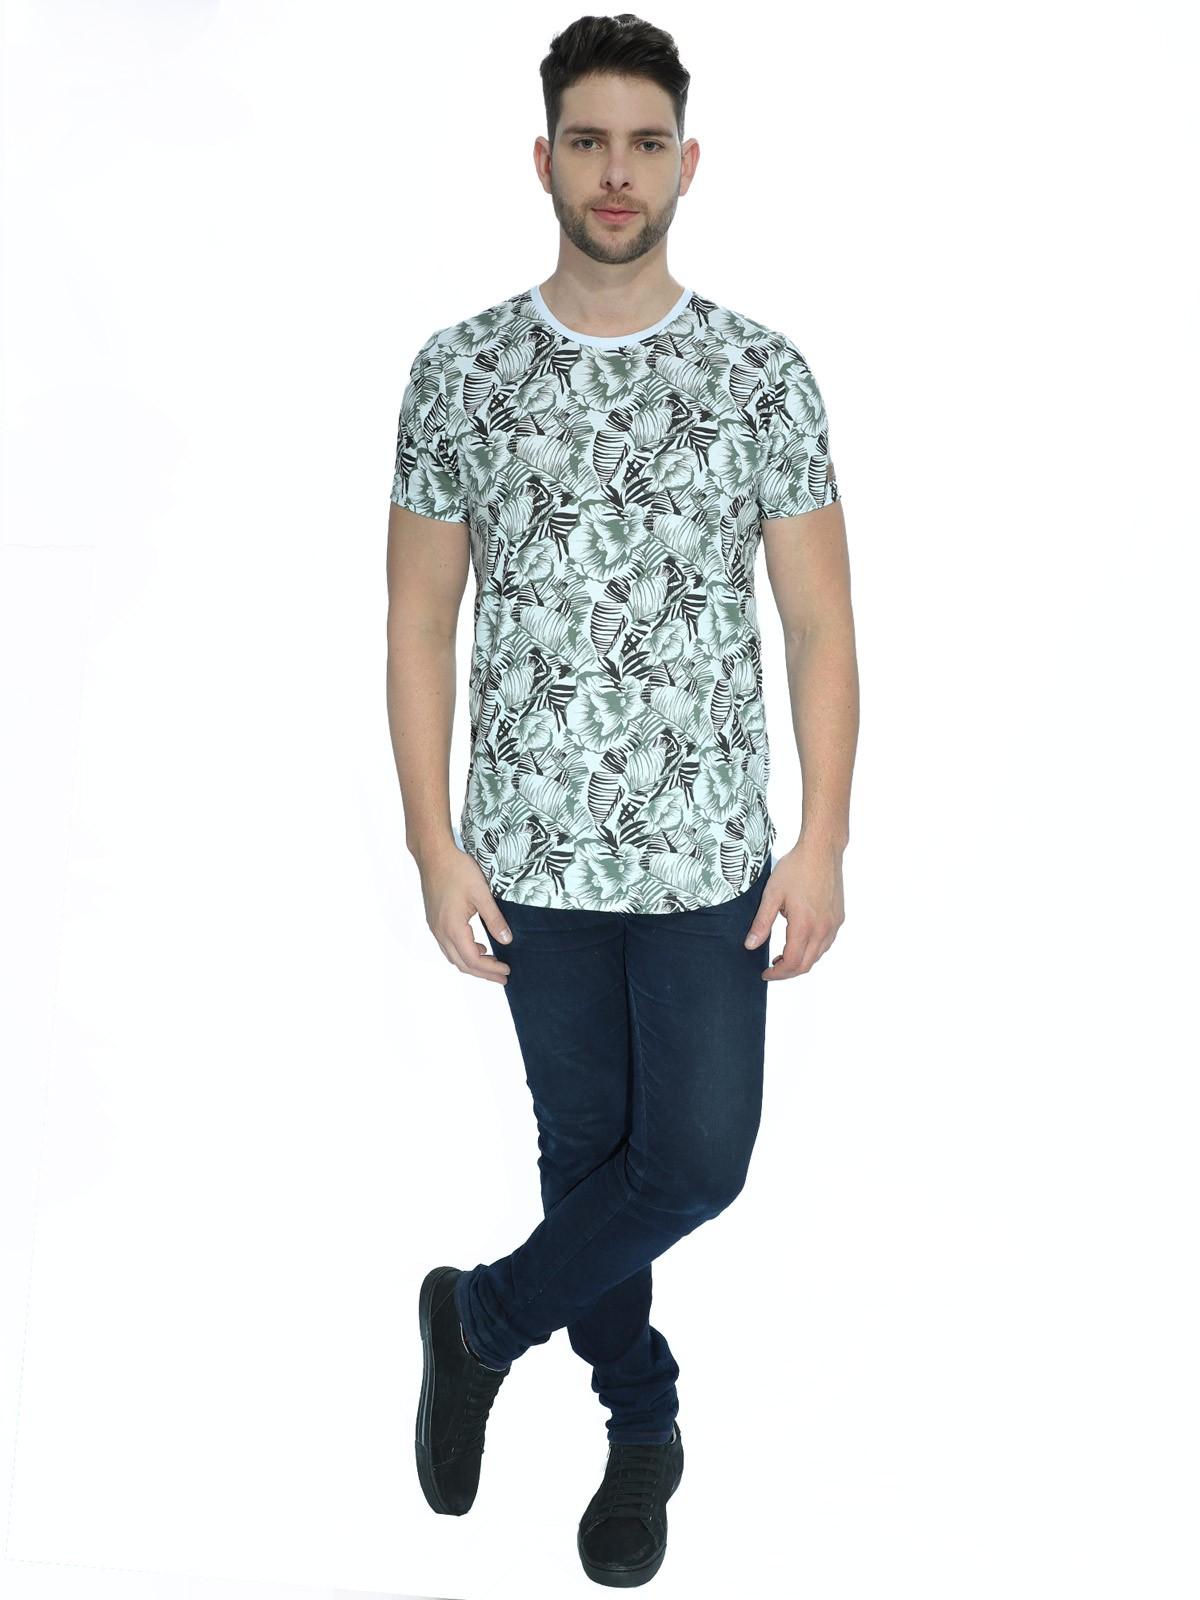 Camiseta Masculina Floral Longline Branca